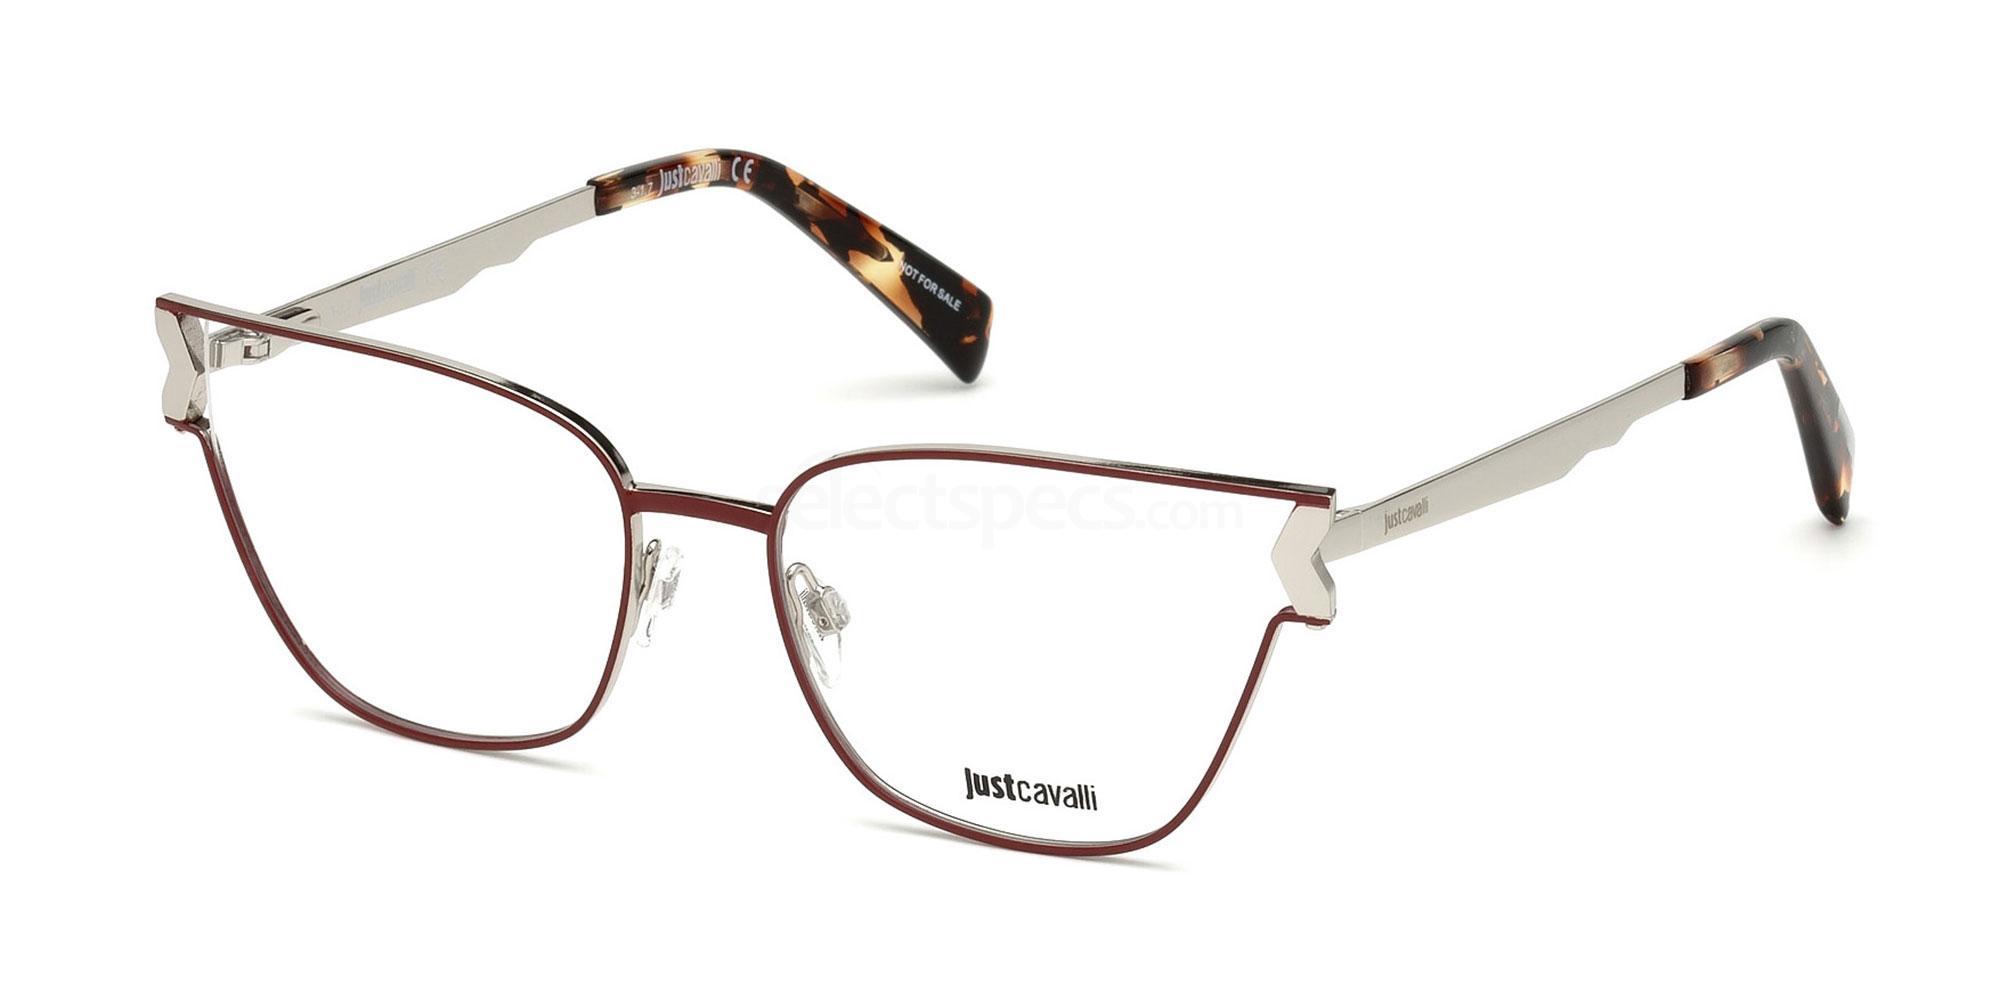 016 JC0815 Glasses, Just Cavalli